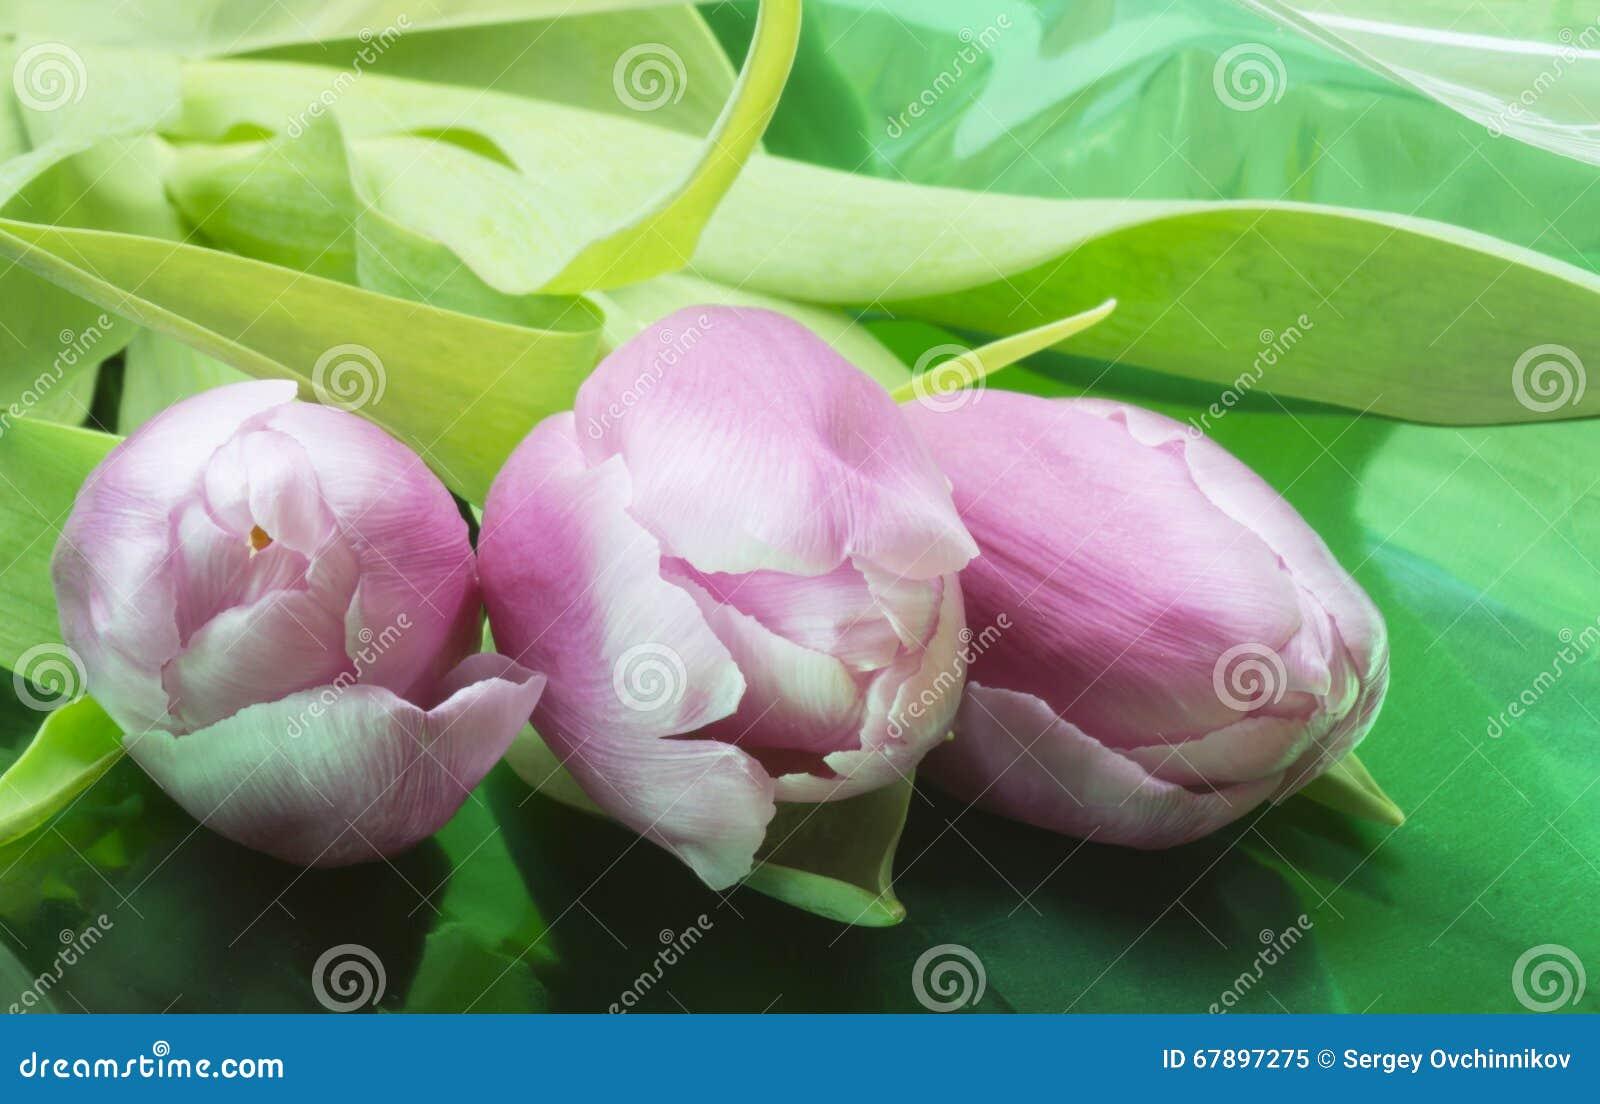 Ramalhete da tulipa vermelha e branca